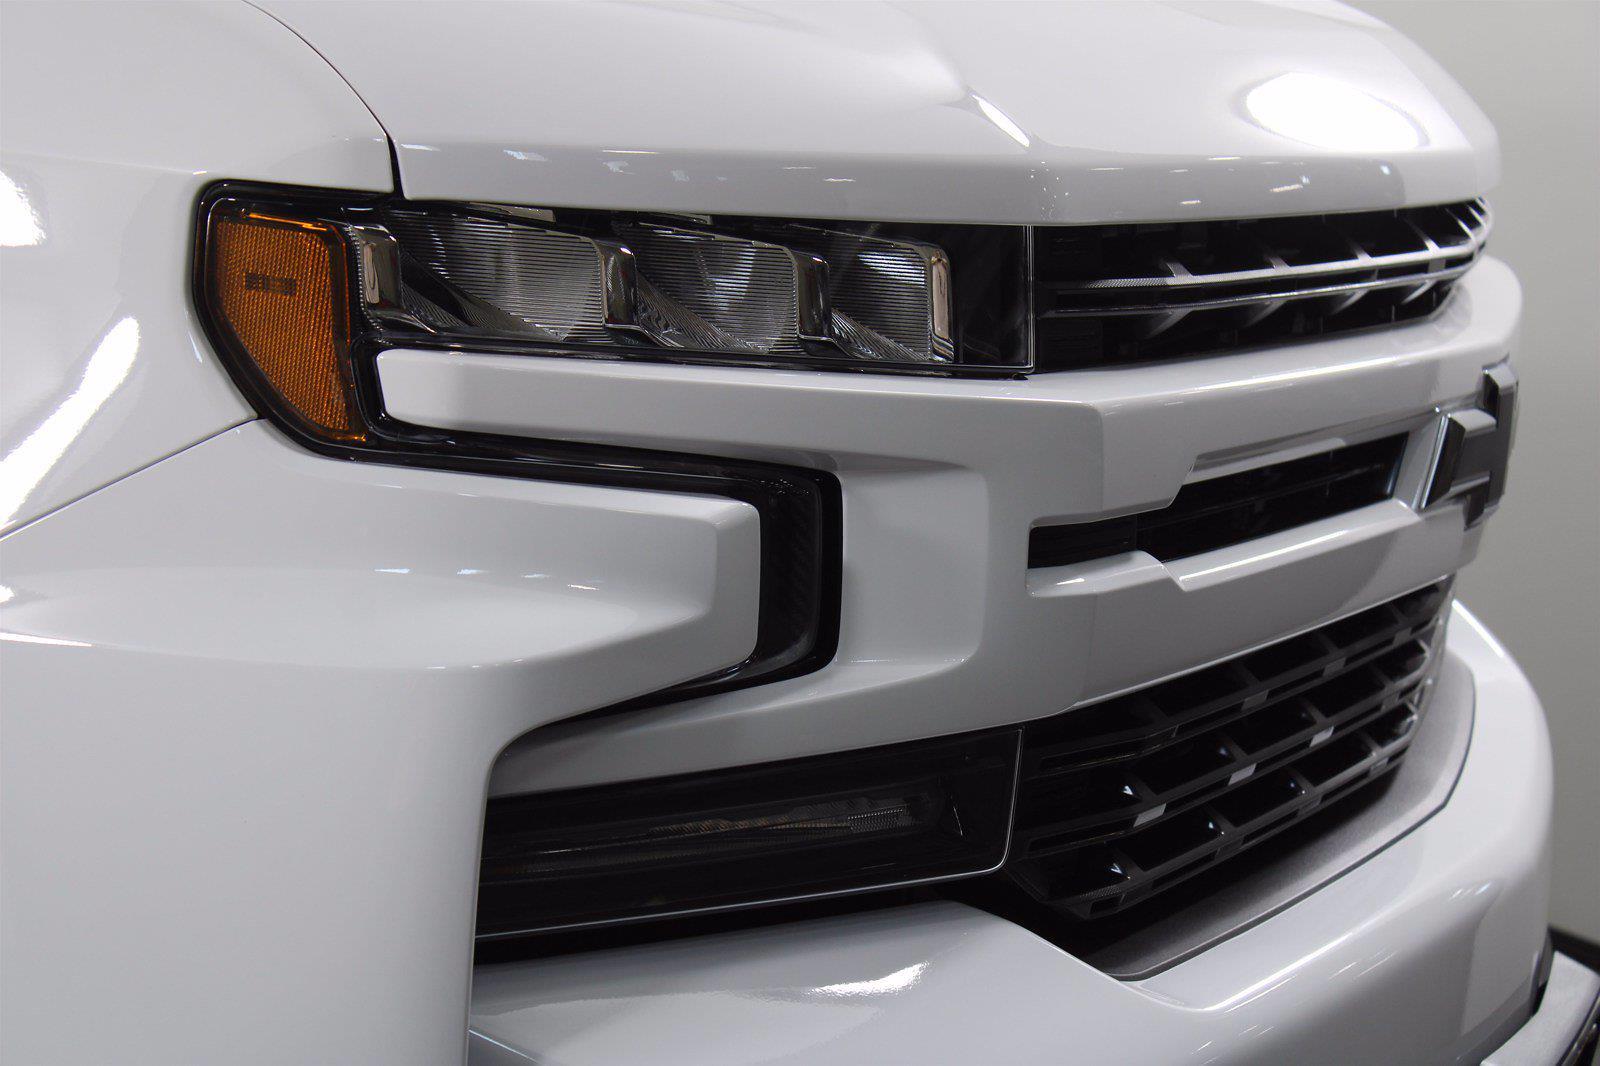 2021 Chevrolet Silverado 1500 Crew Cab 4x4, Pickup #D111073 - photo 5